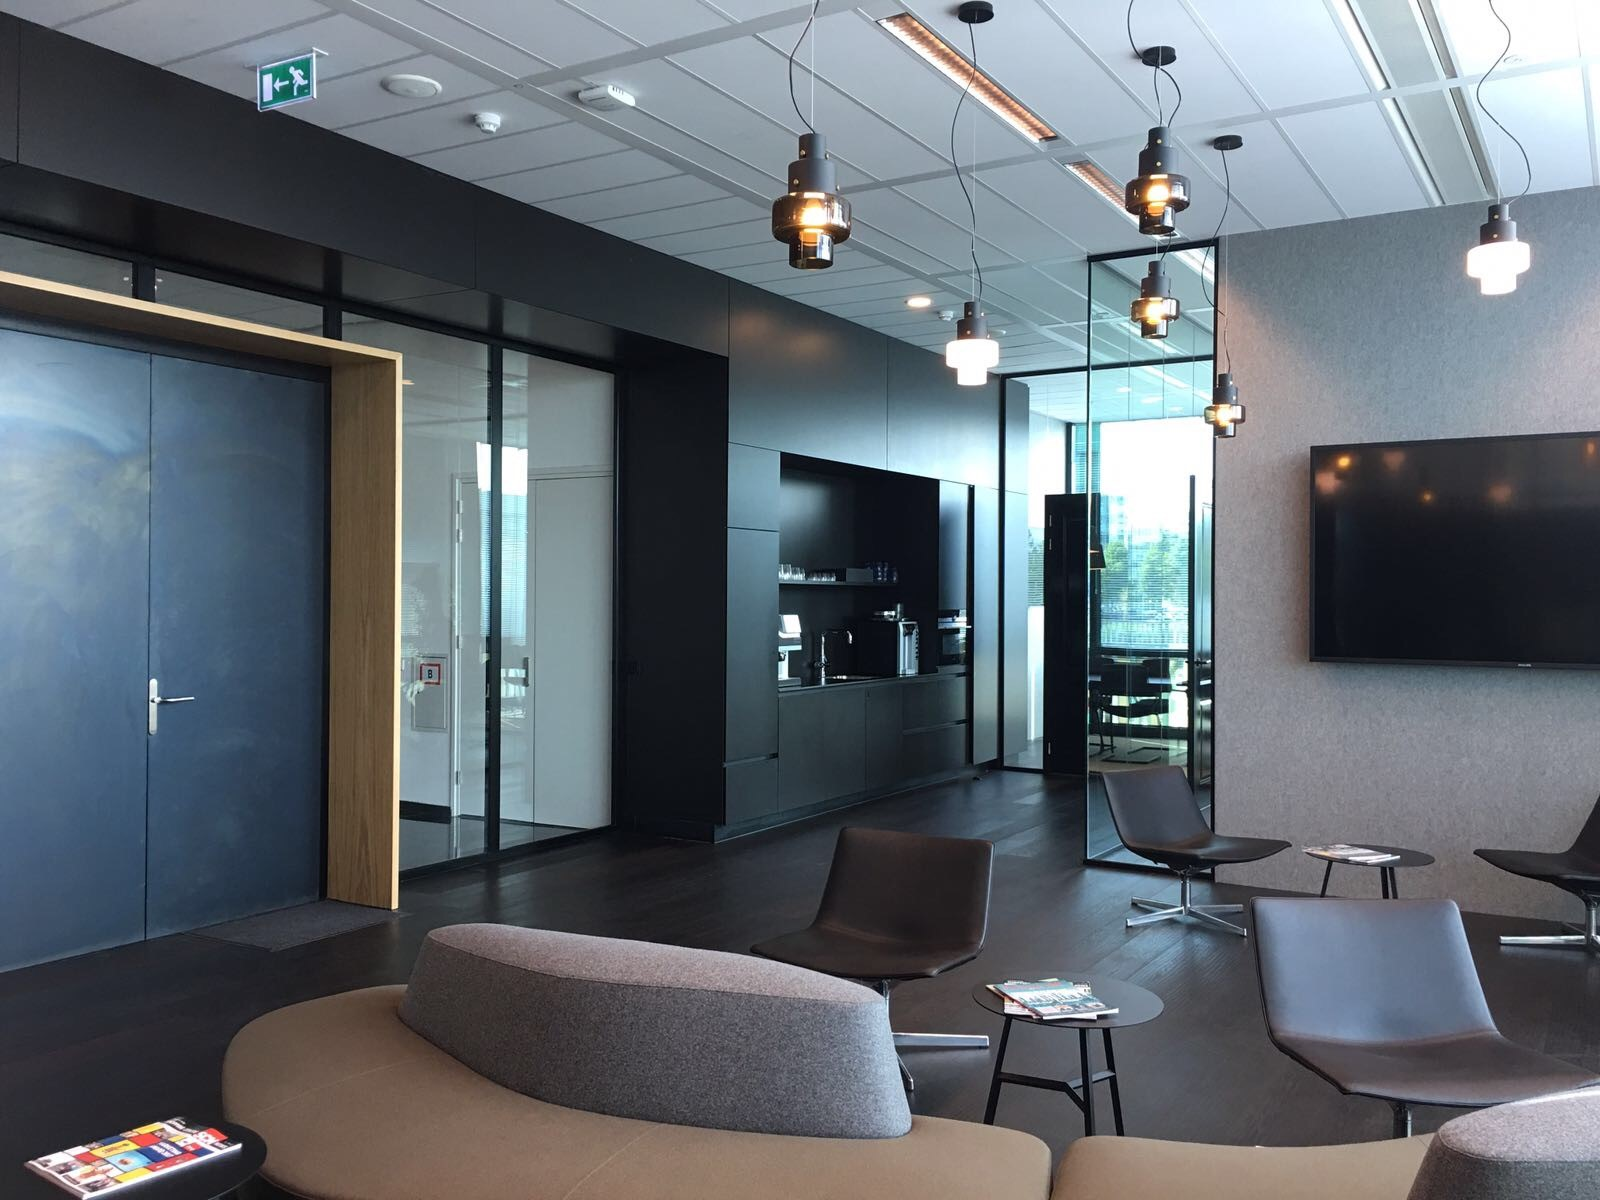 Samenwerken met interieurarchitect voor for Interieurarchitect amsterdam